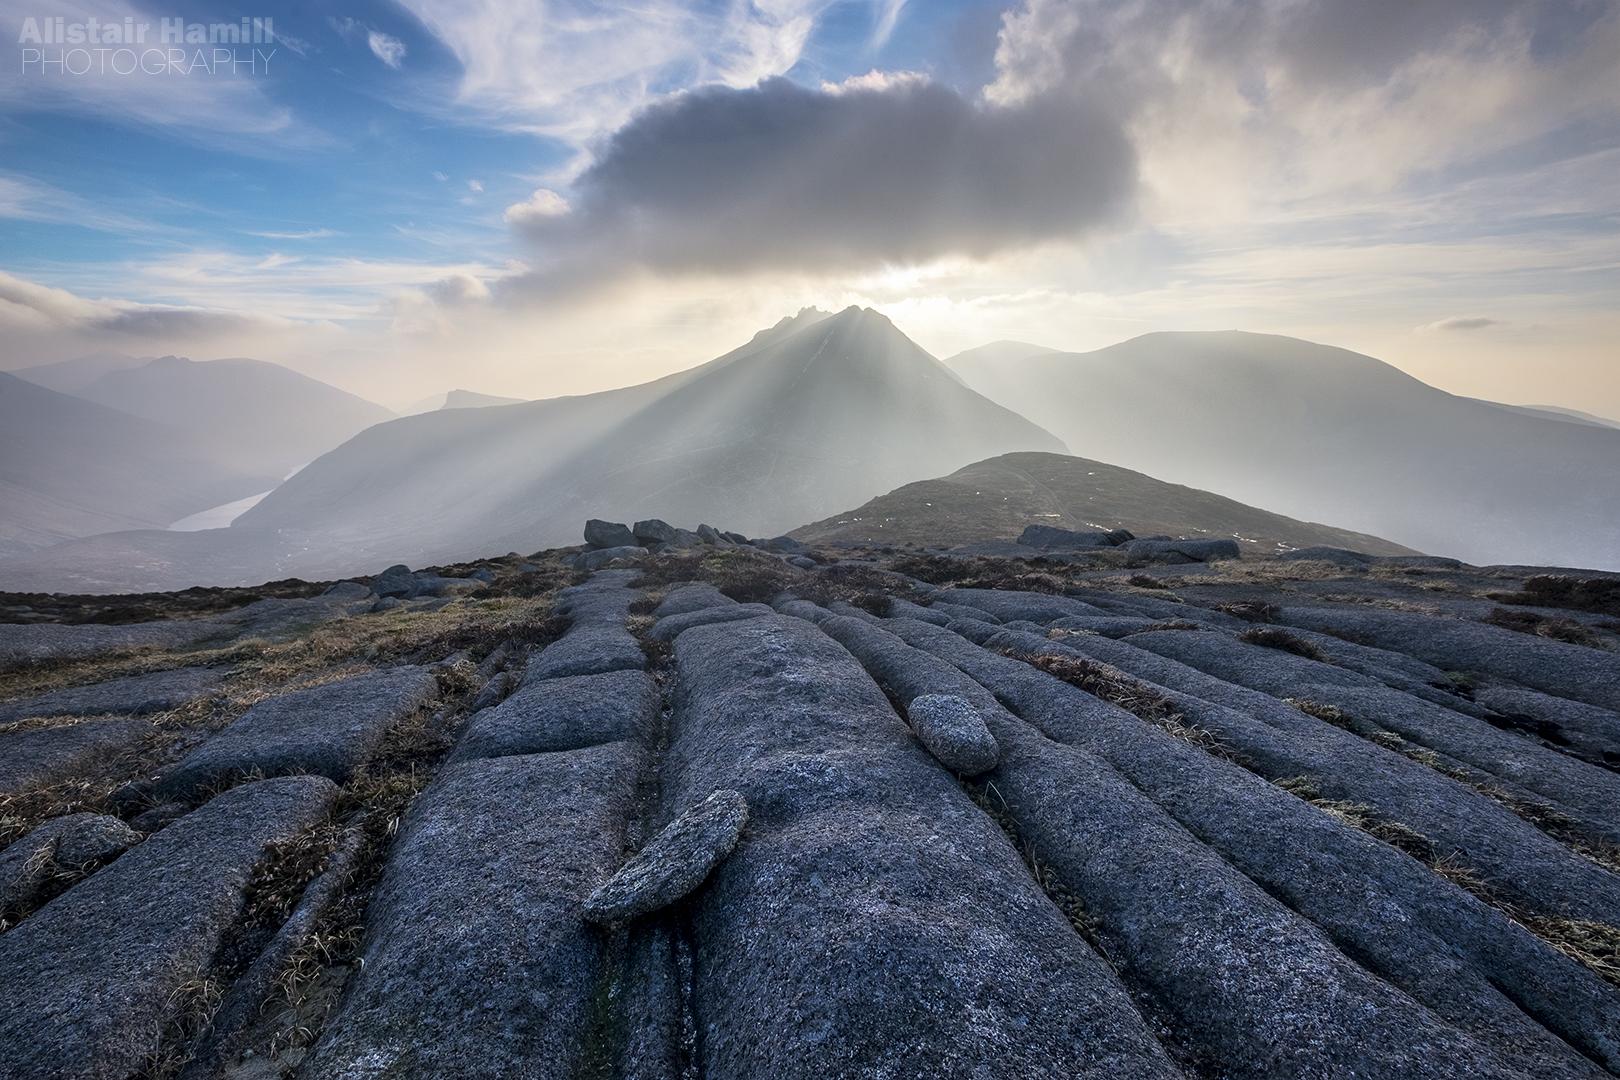 Bearnagh Crepuscular landscape 1 (large) WM.jpg